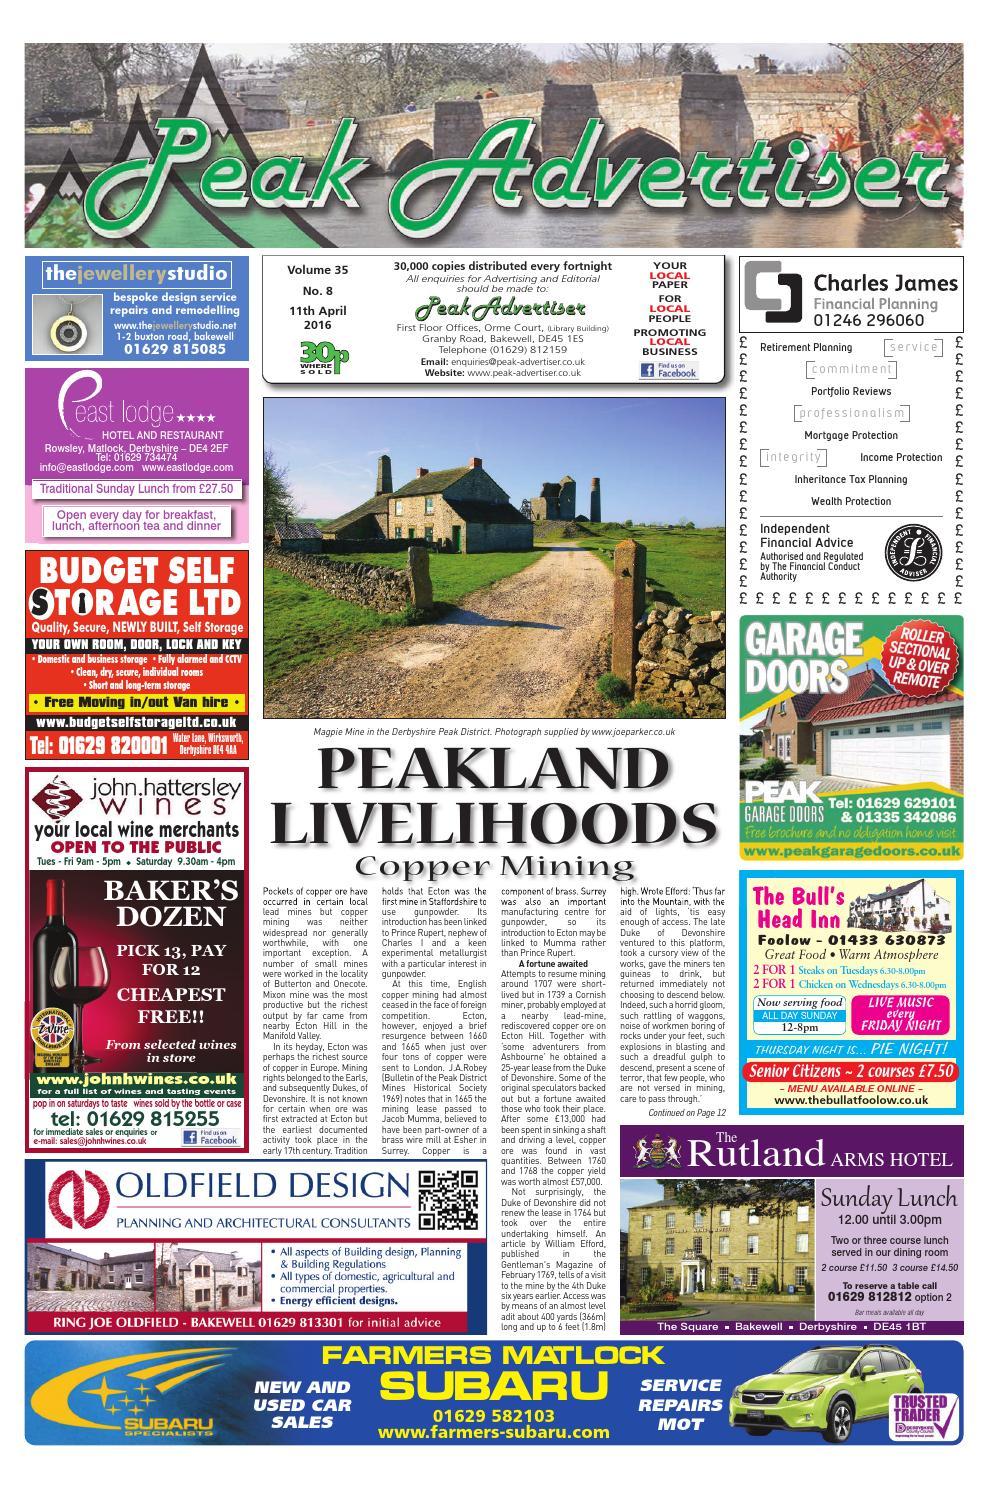 977298095 The Peak Advertiser 11.4.16 by Peak Advertiser - issuu